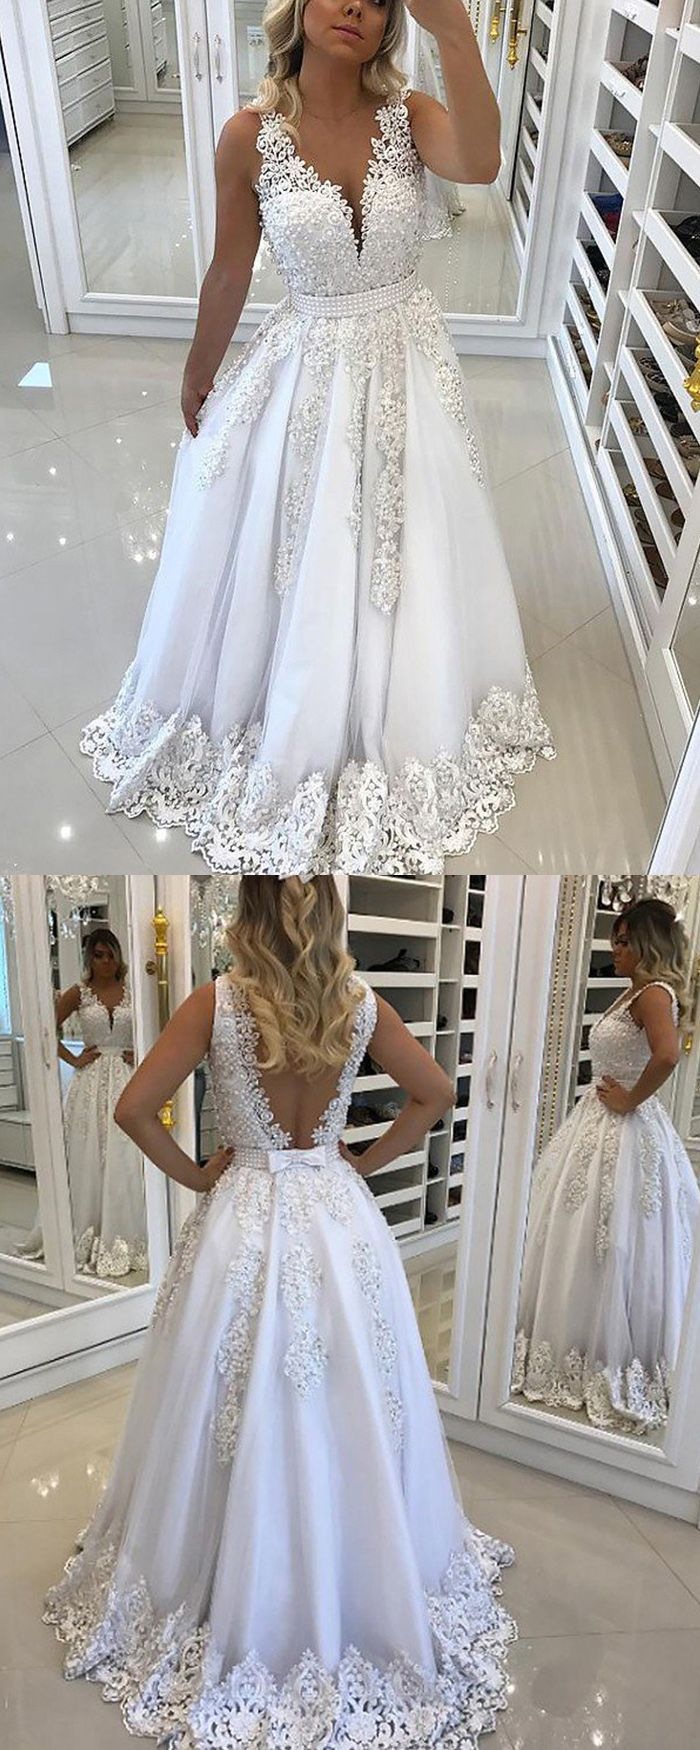 Elegant white vneck lace appliqued princess long prom dress pm